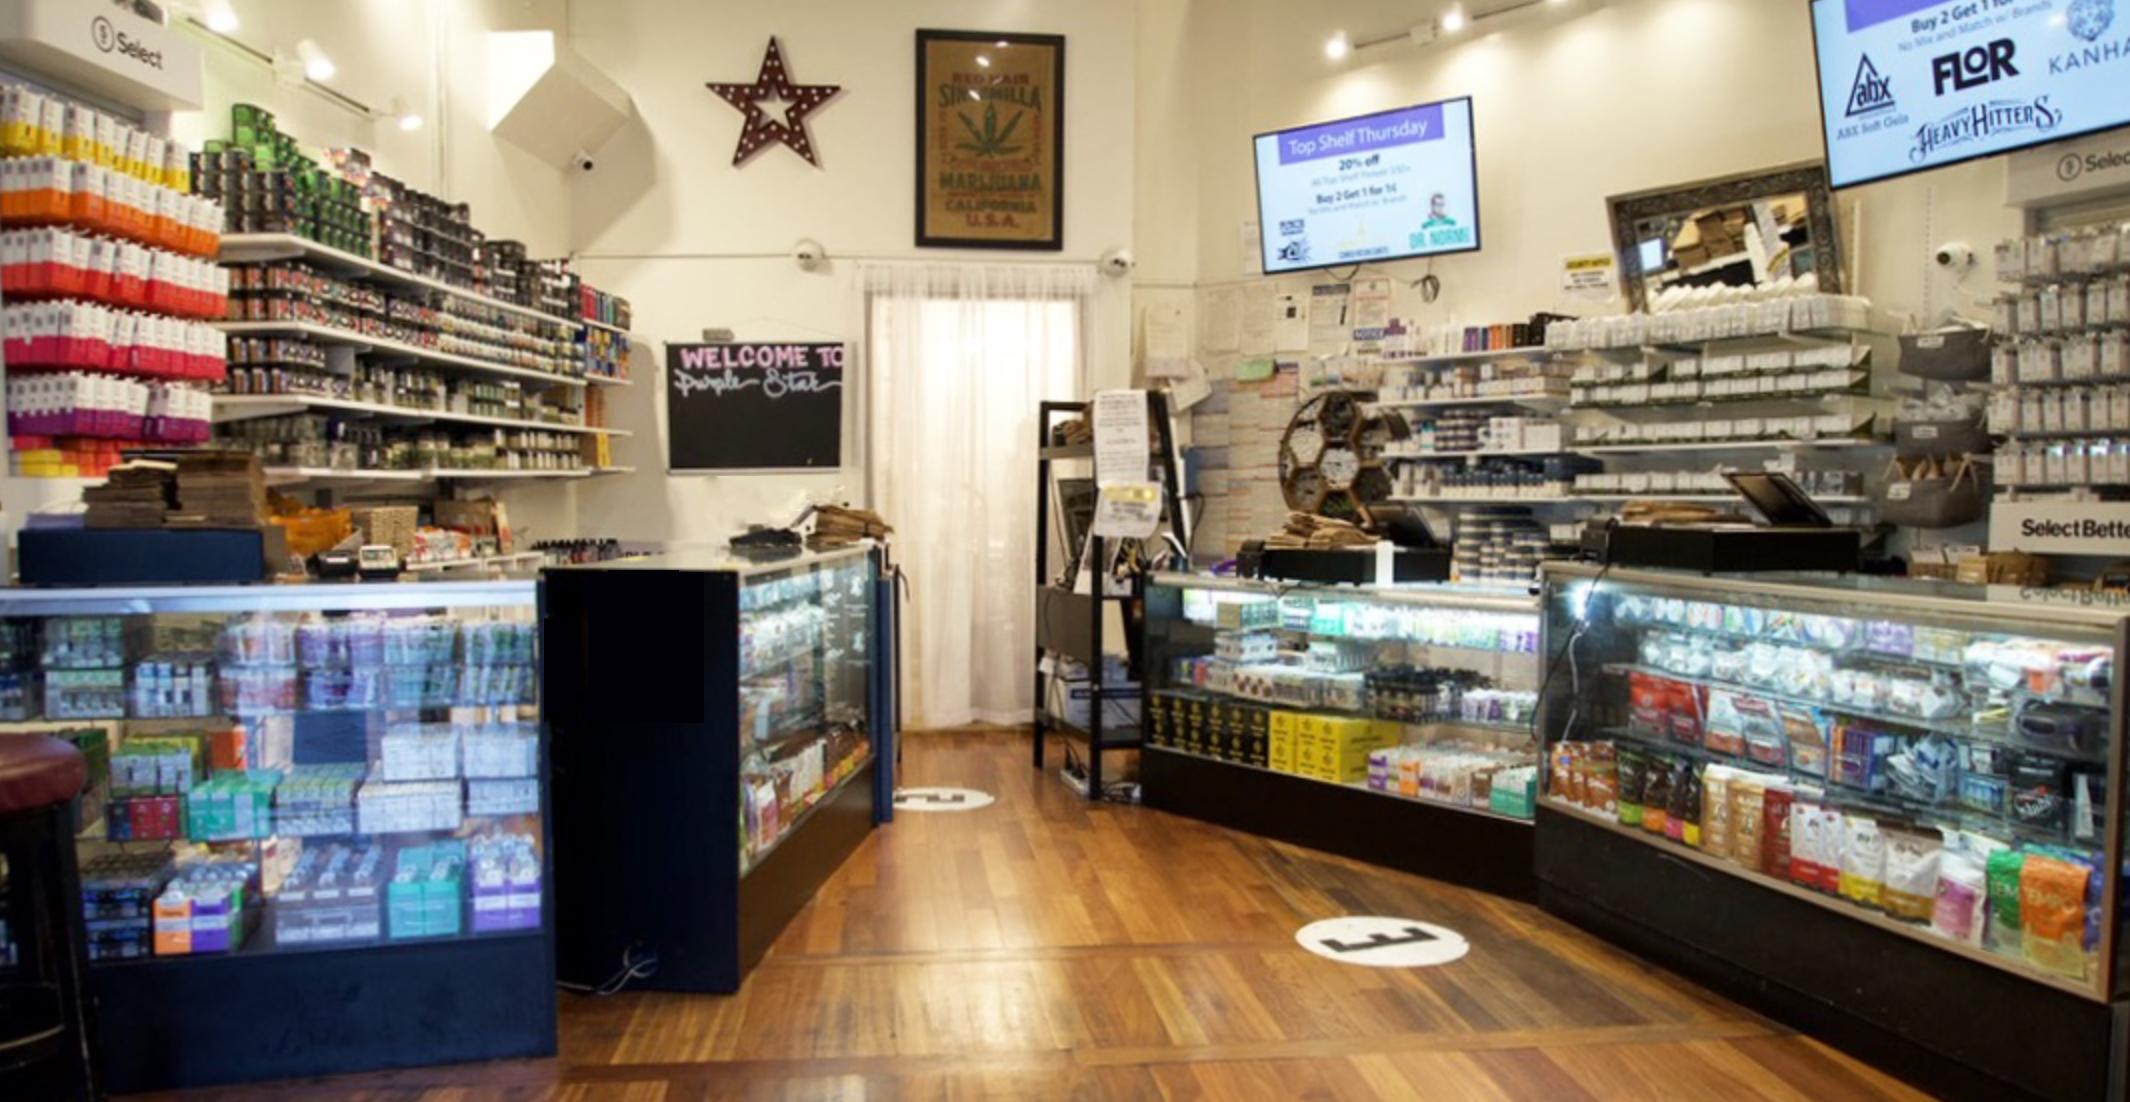 Purple Star storefront